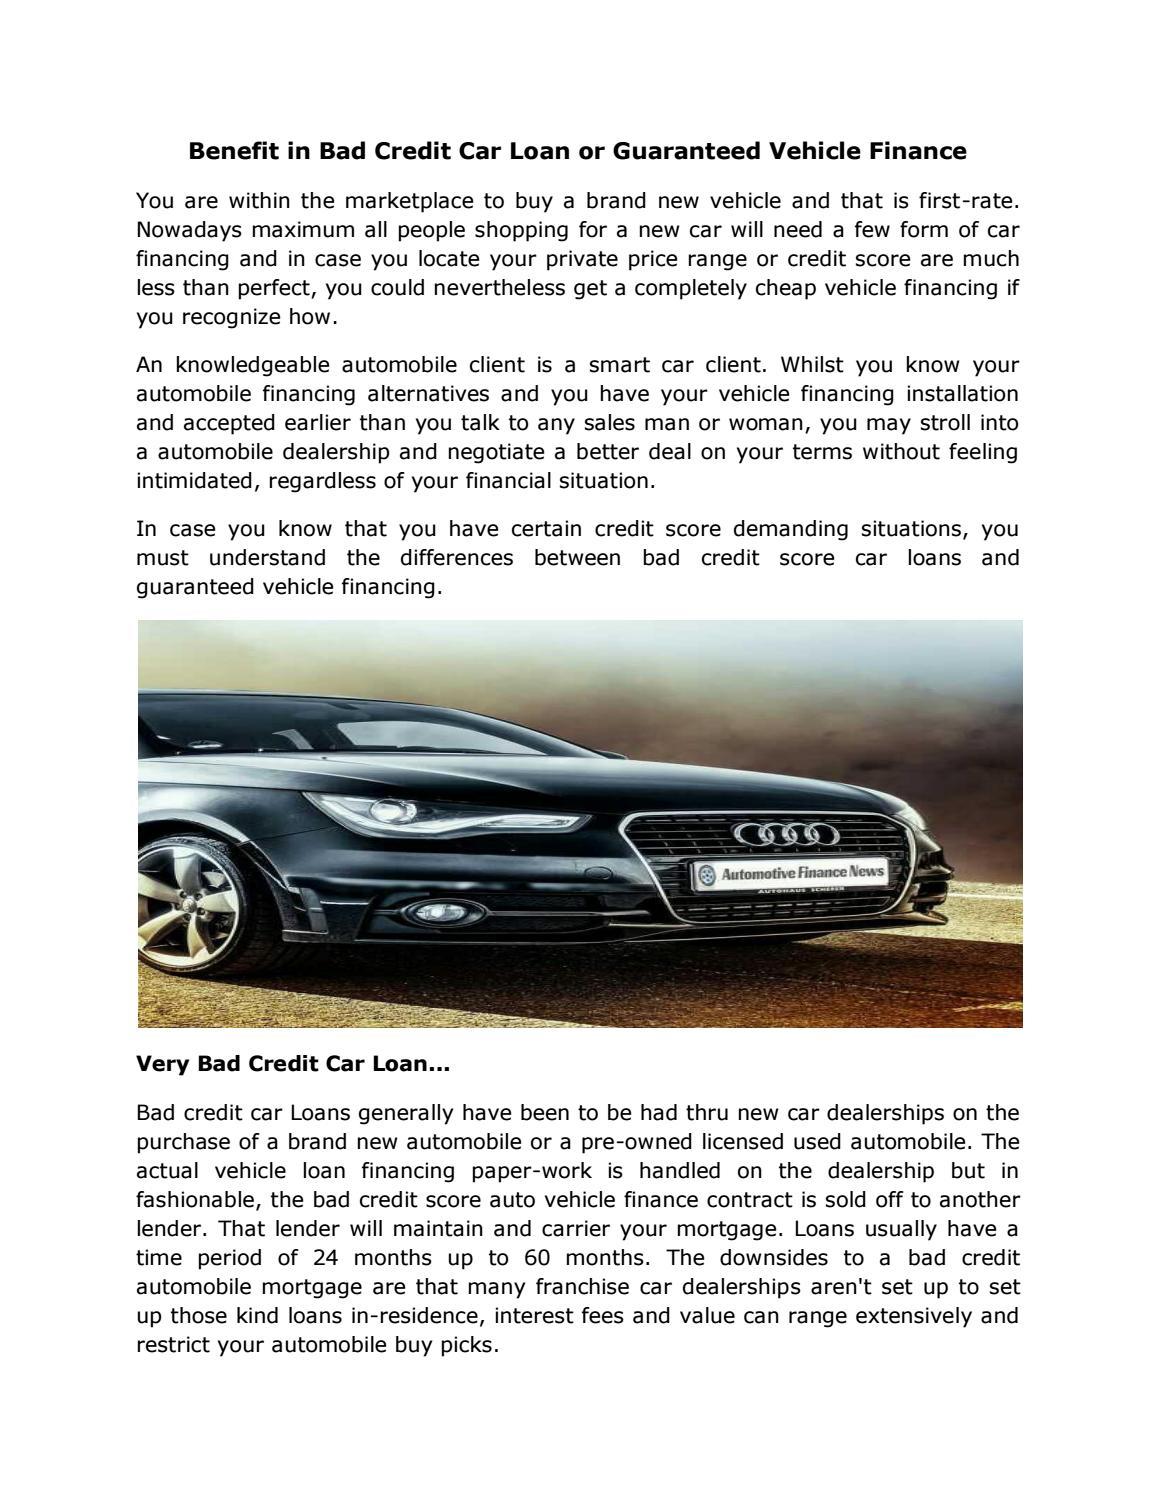 Guaranteed Auto Loan Dealerships >> Bad Credit Car Loan Or Guaranteed Vehicle Finance By Bc Auto